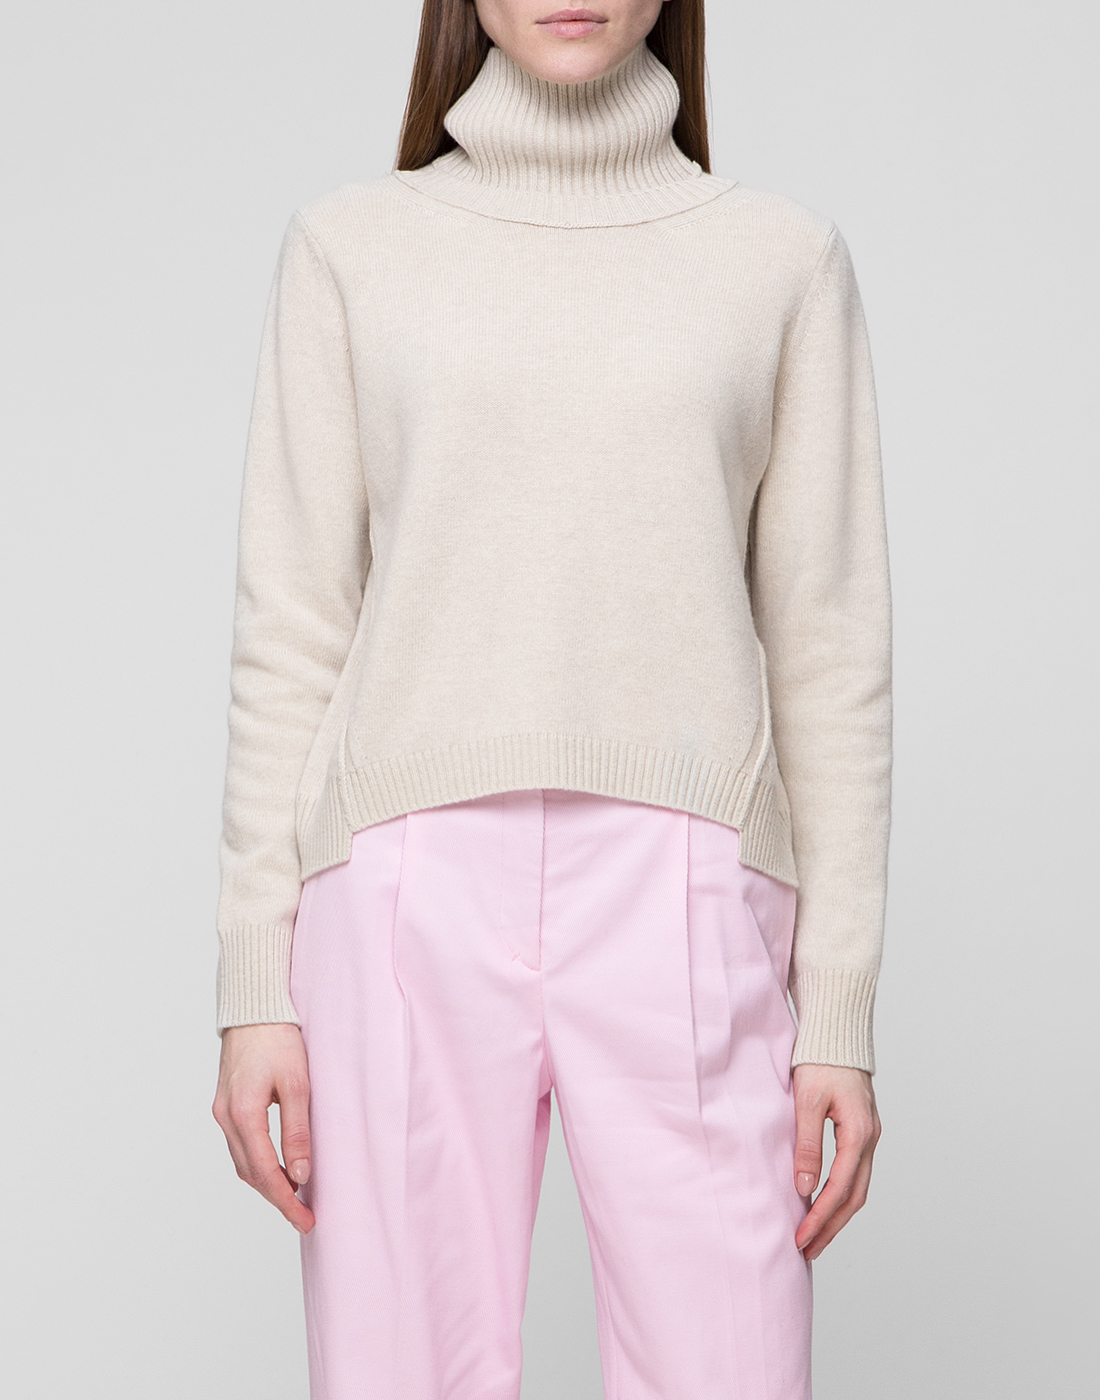 Женские розовые брюки Dorothee Schumacher S640403/421-2